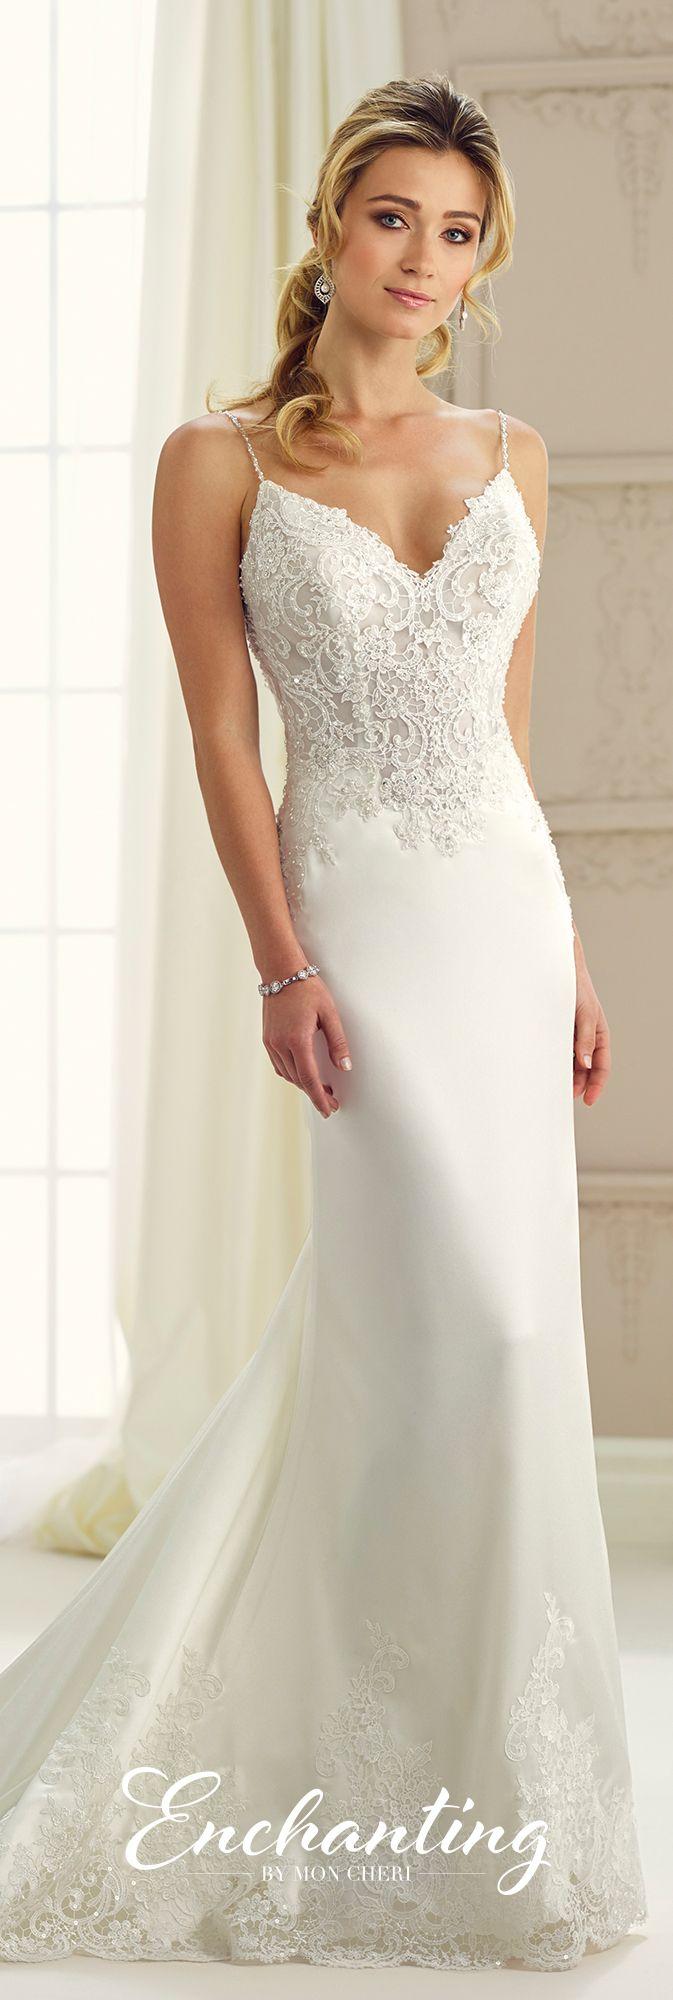 enchanted wedding dress and satin